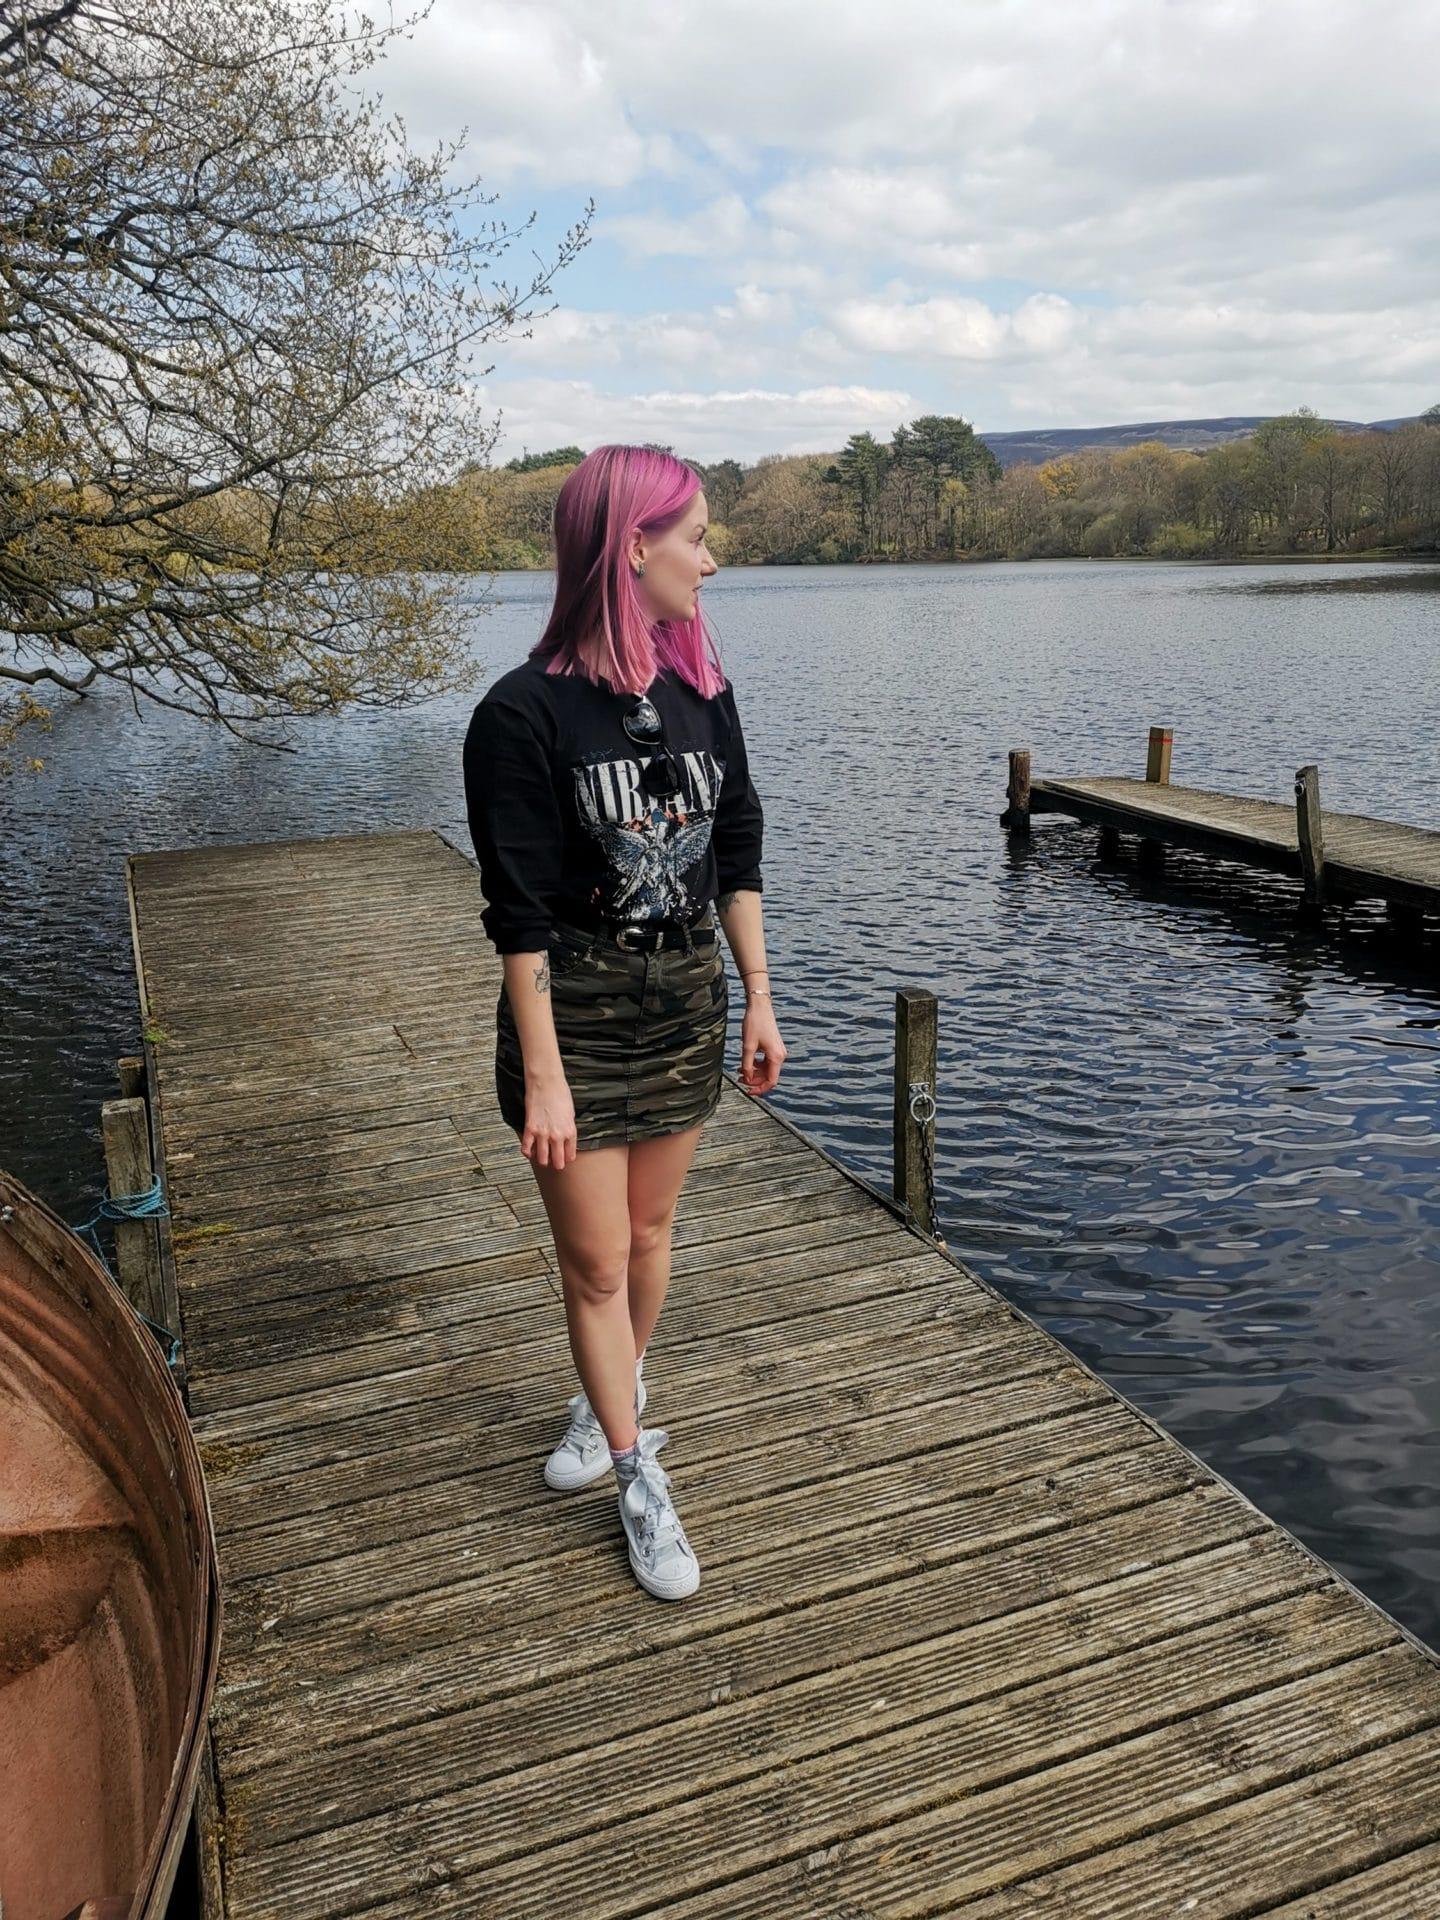 Pretty_Little_Thing_Nirvana_Tee_Camo_Skirt